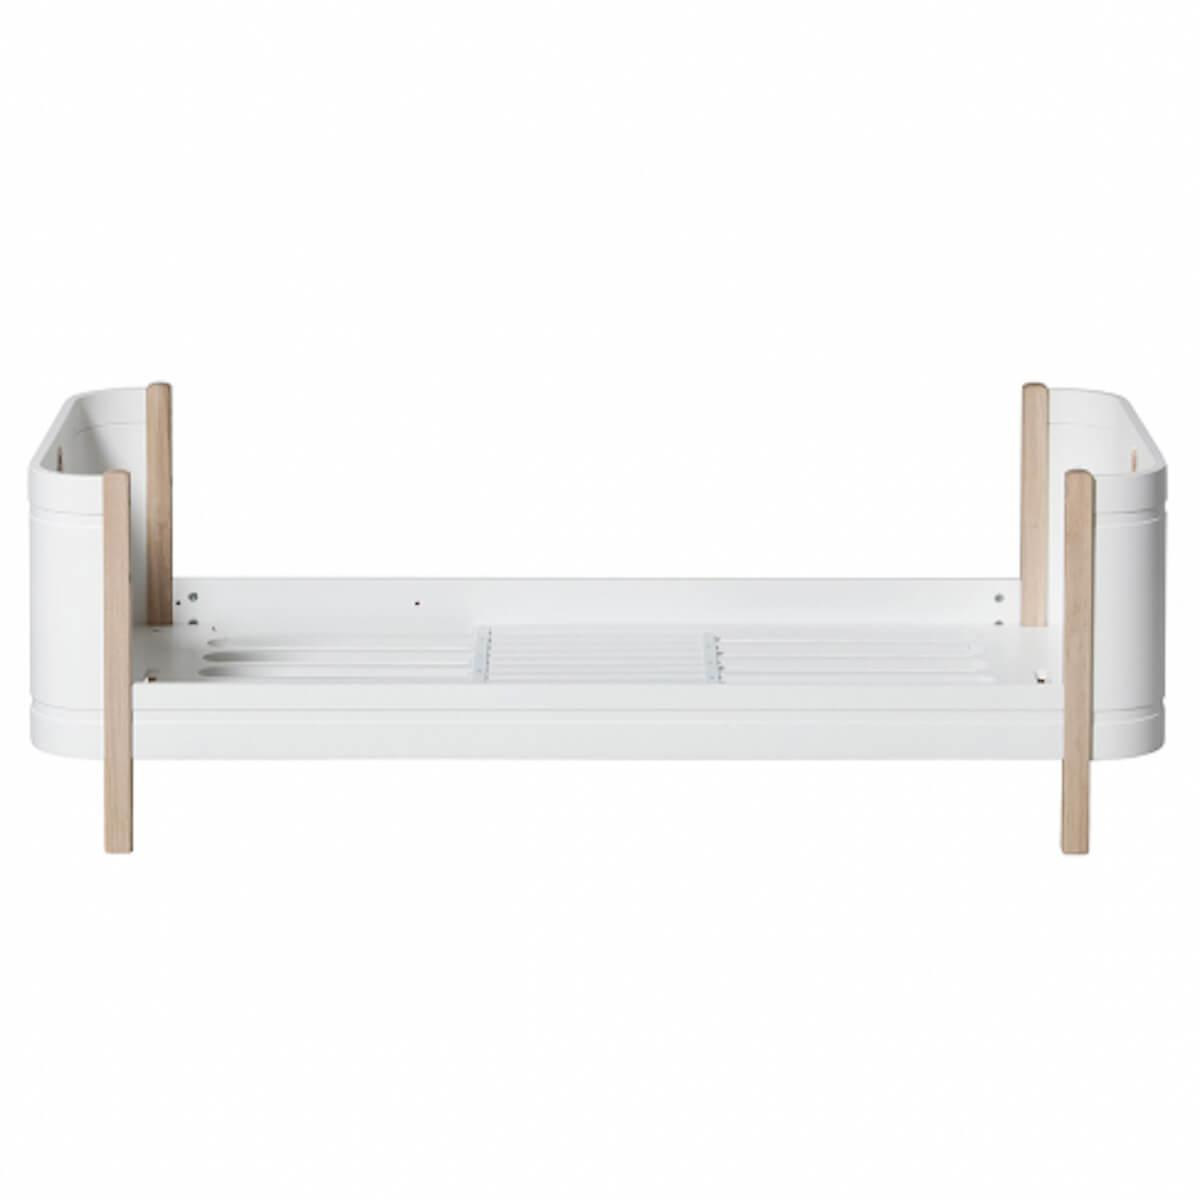 Cama 68x162cm WOOD MINI+ Oliver Furniture blanco-roble